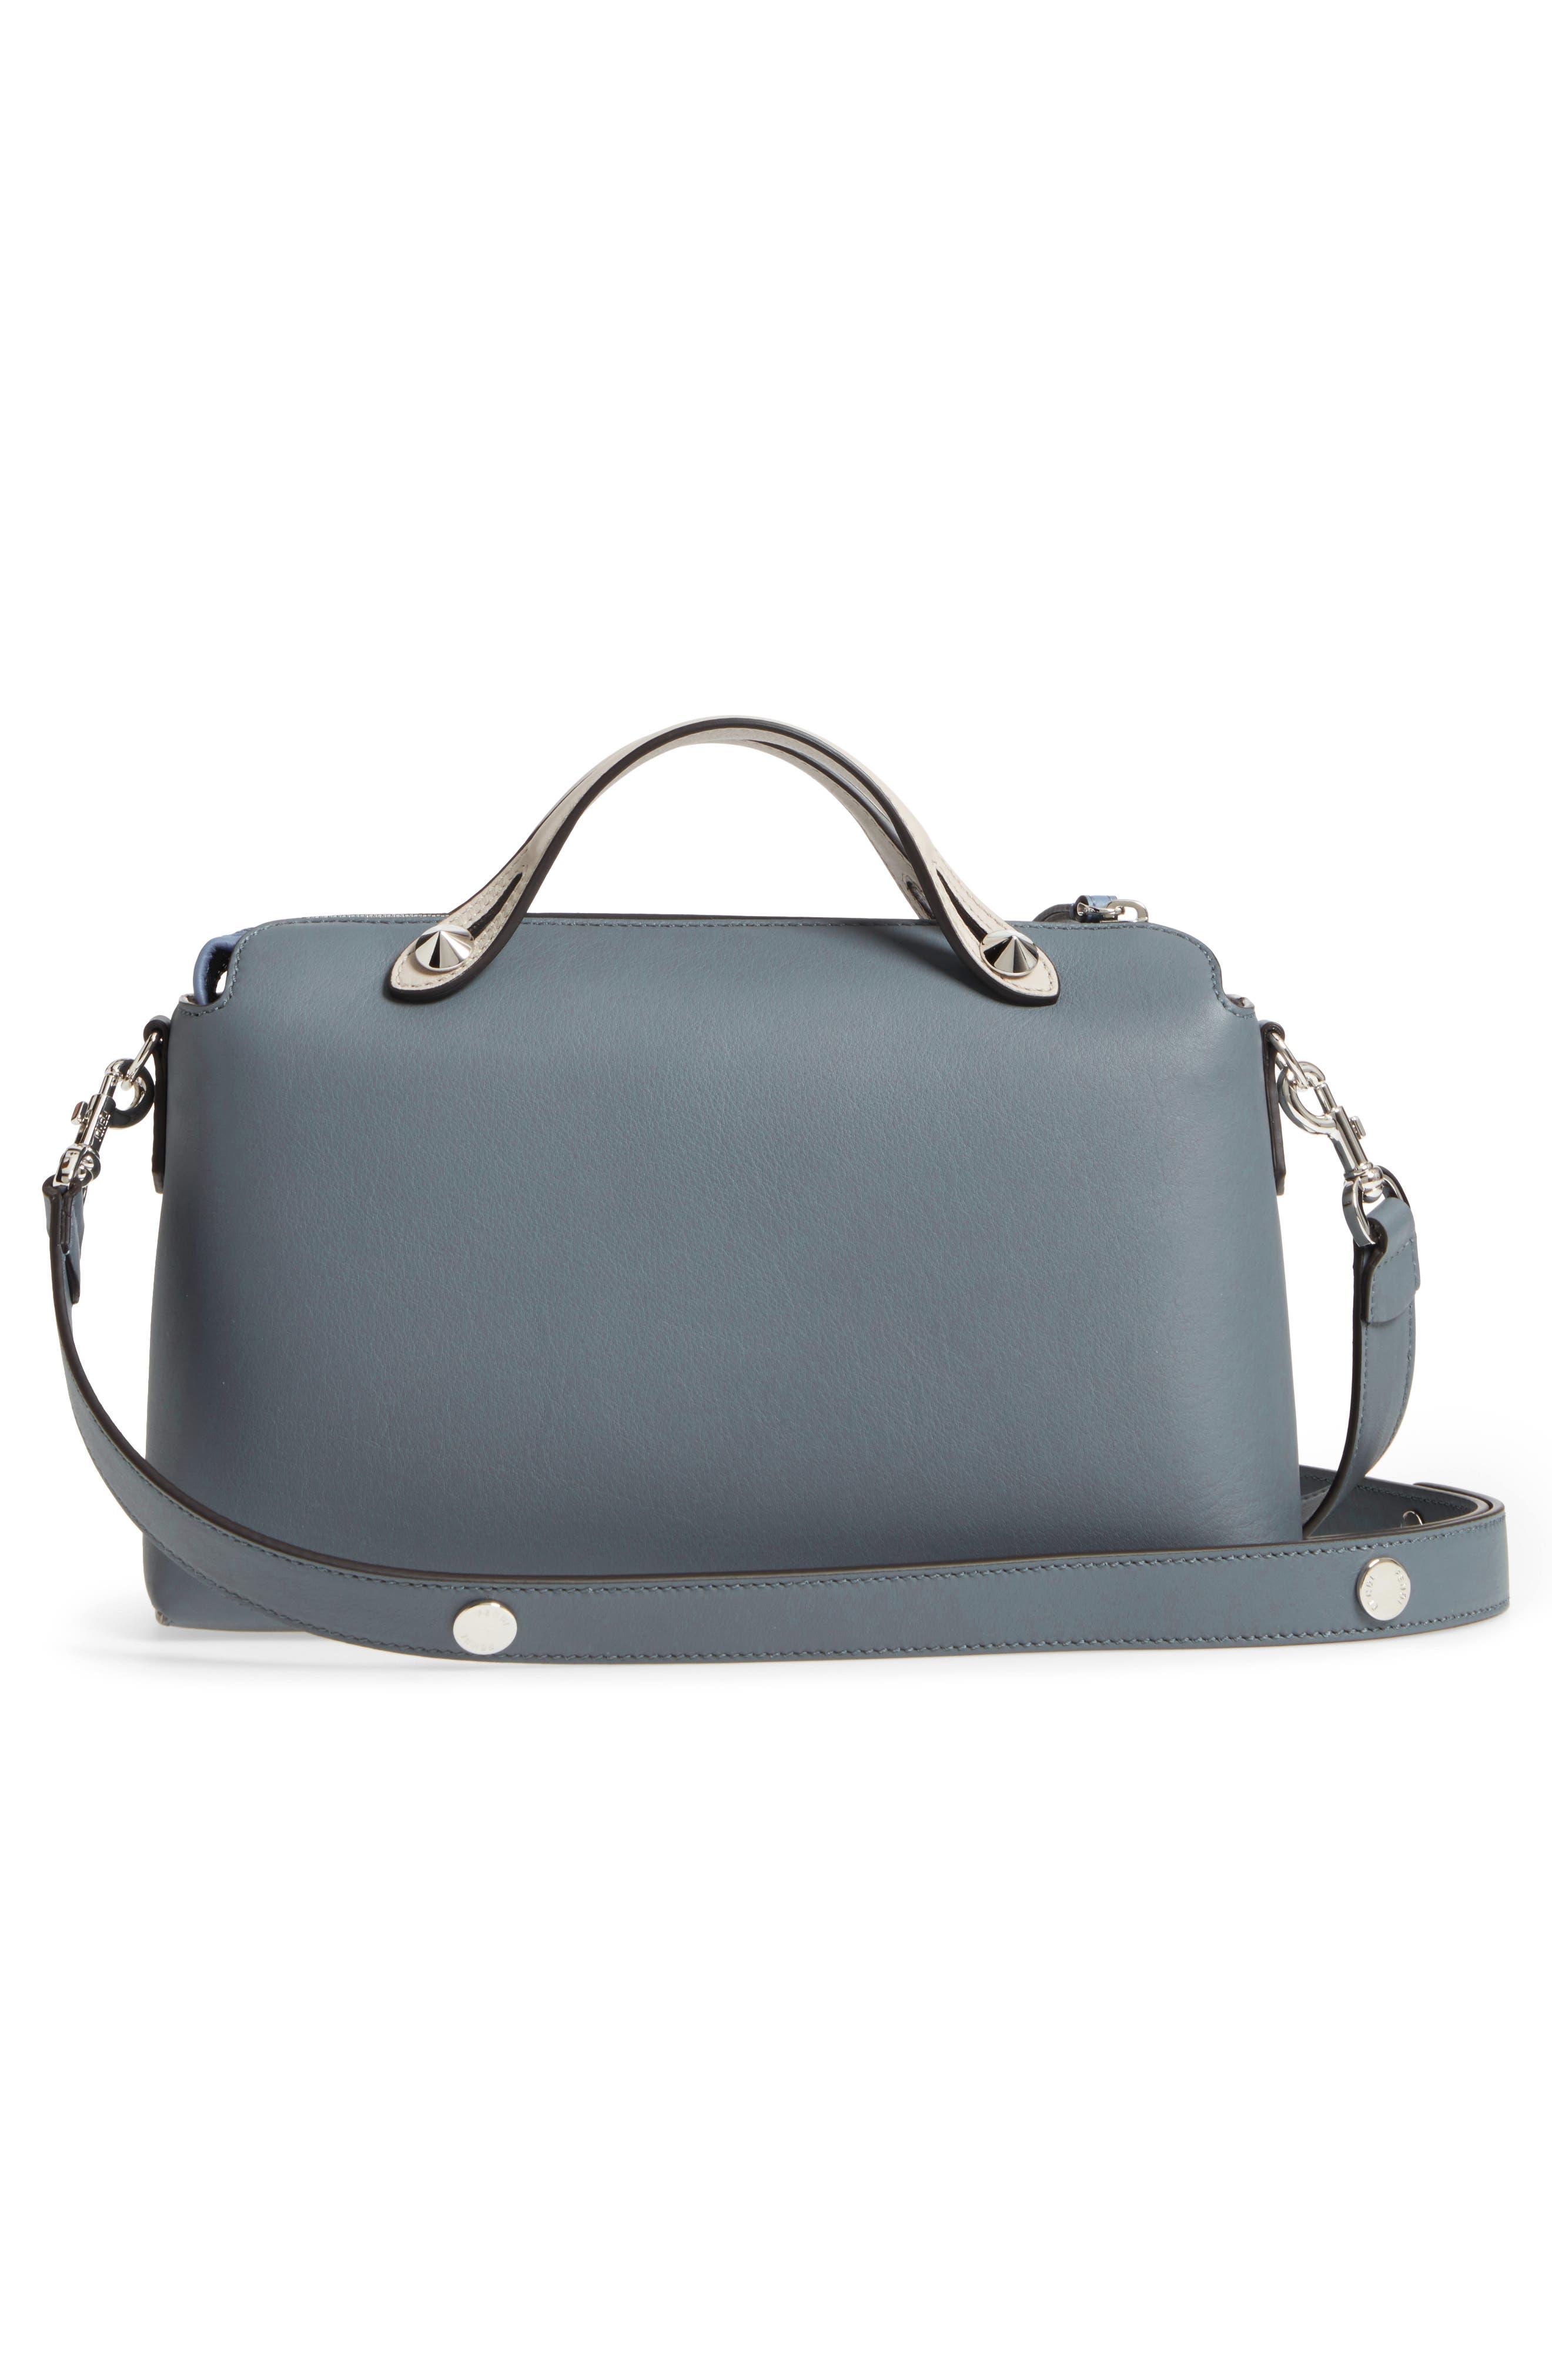 Alternate Image 3  - Fendi 'Medium By the Way' Colorblock Leather Shoulder Bag